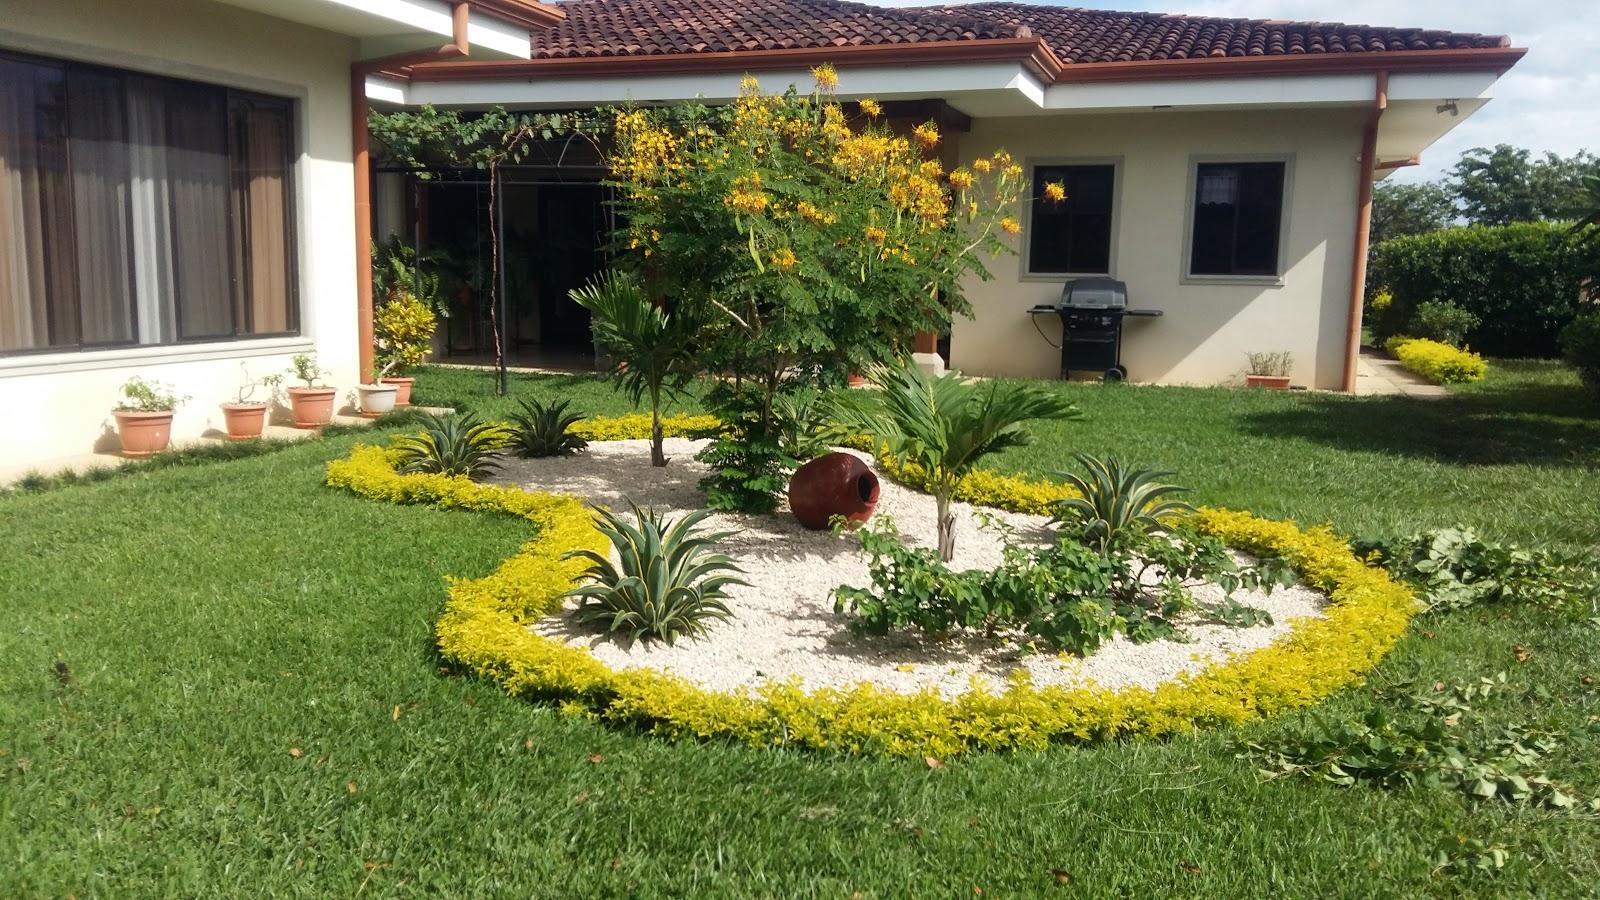 Dise o de jardines liberia for Modelos de jardines en casa